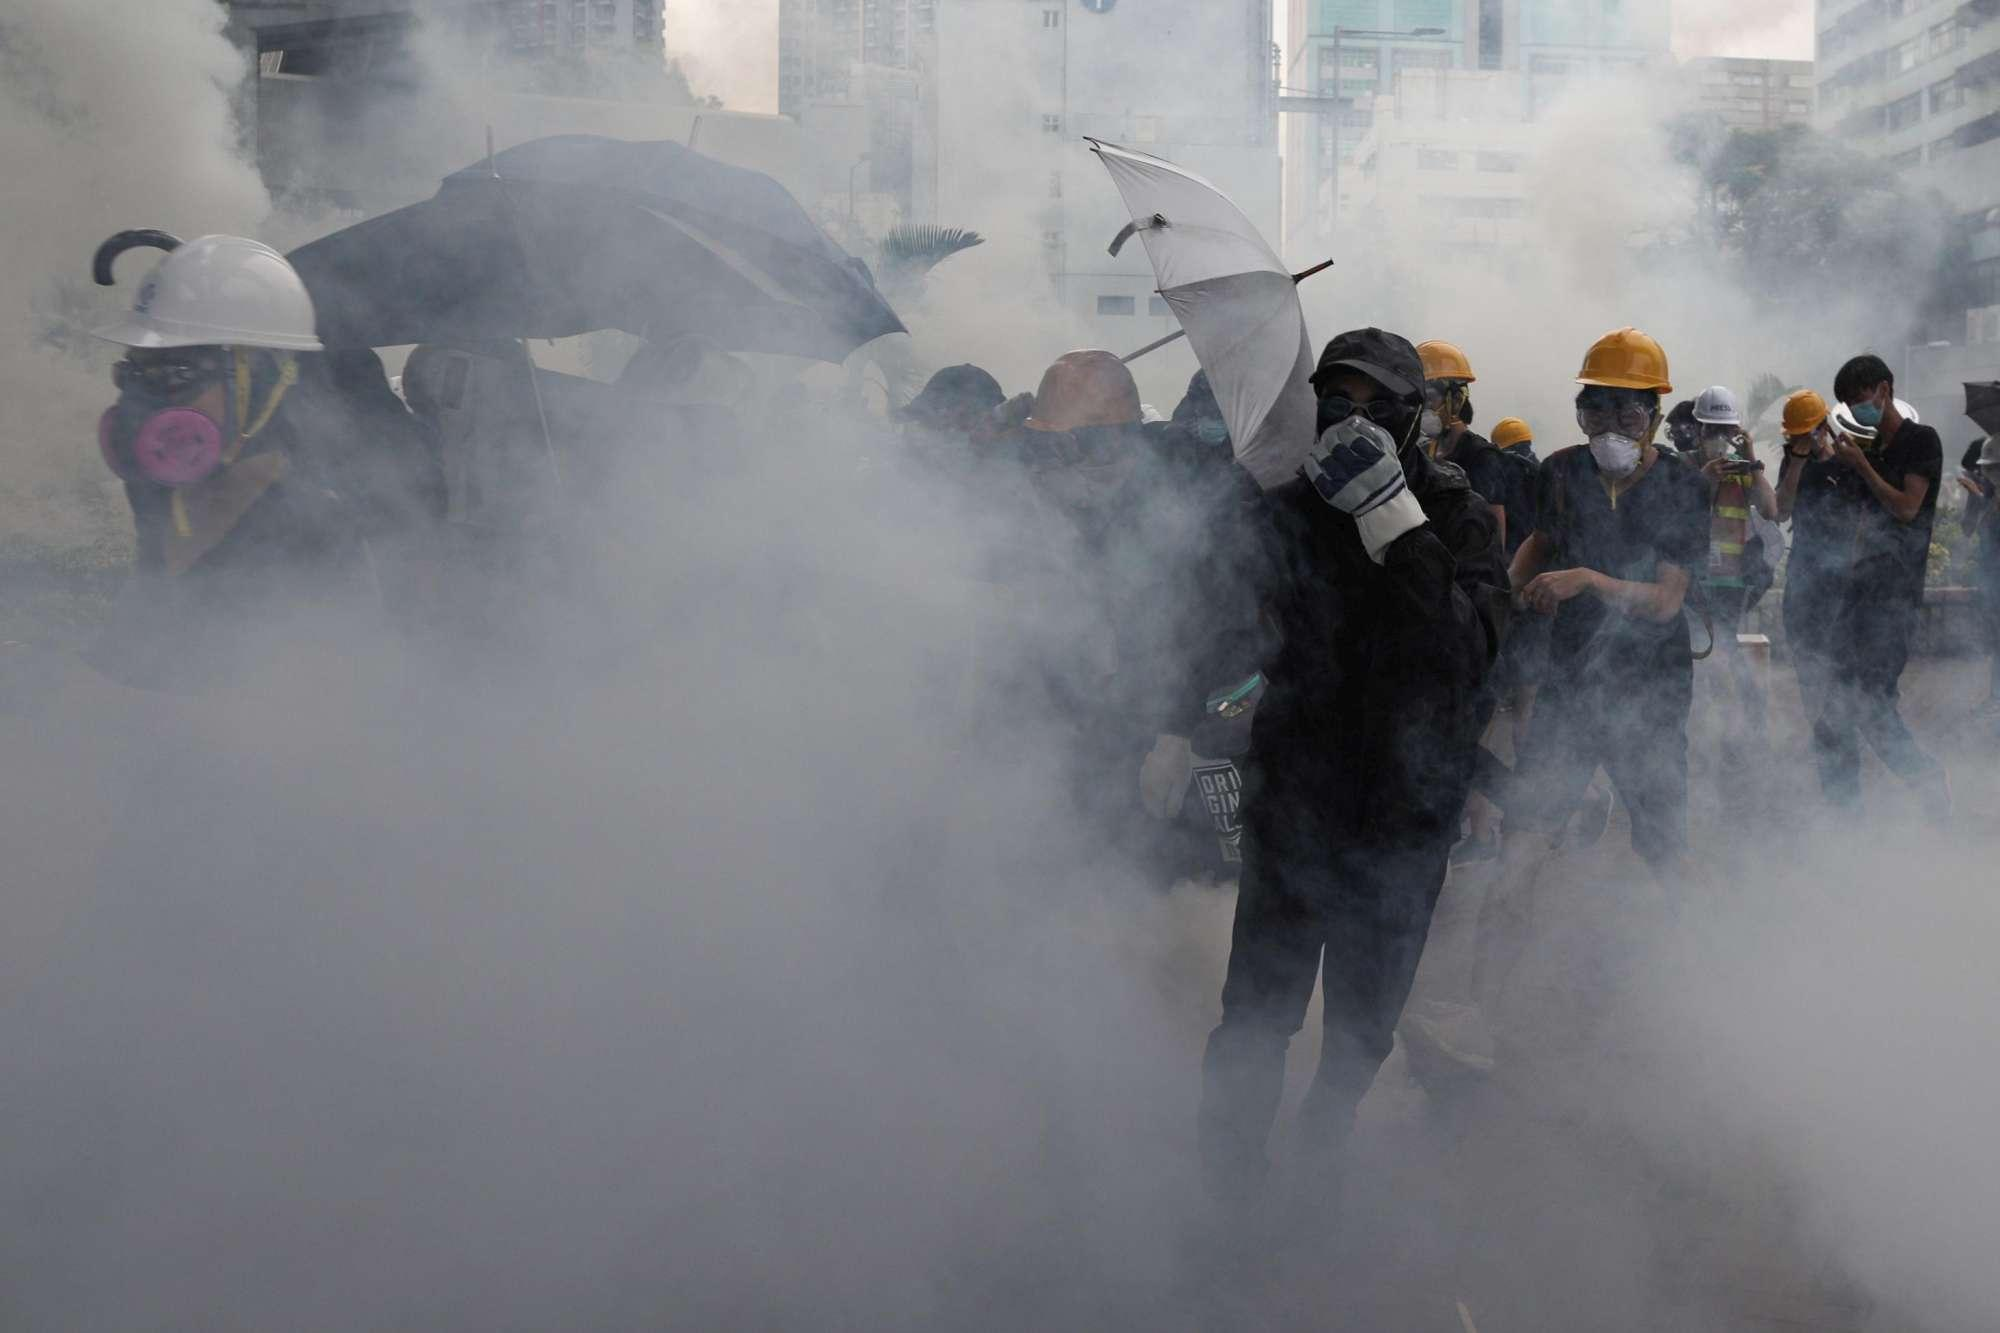 Ancora proteste a Hong Kong: scontri tra polizia e manifestanti